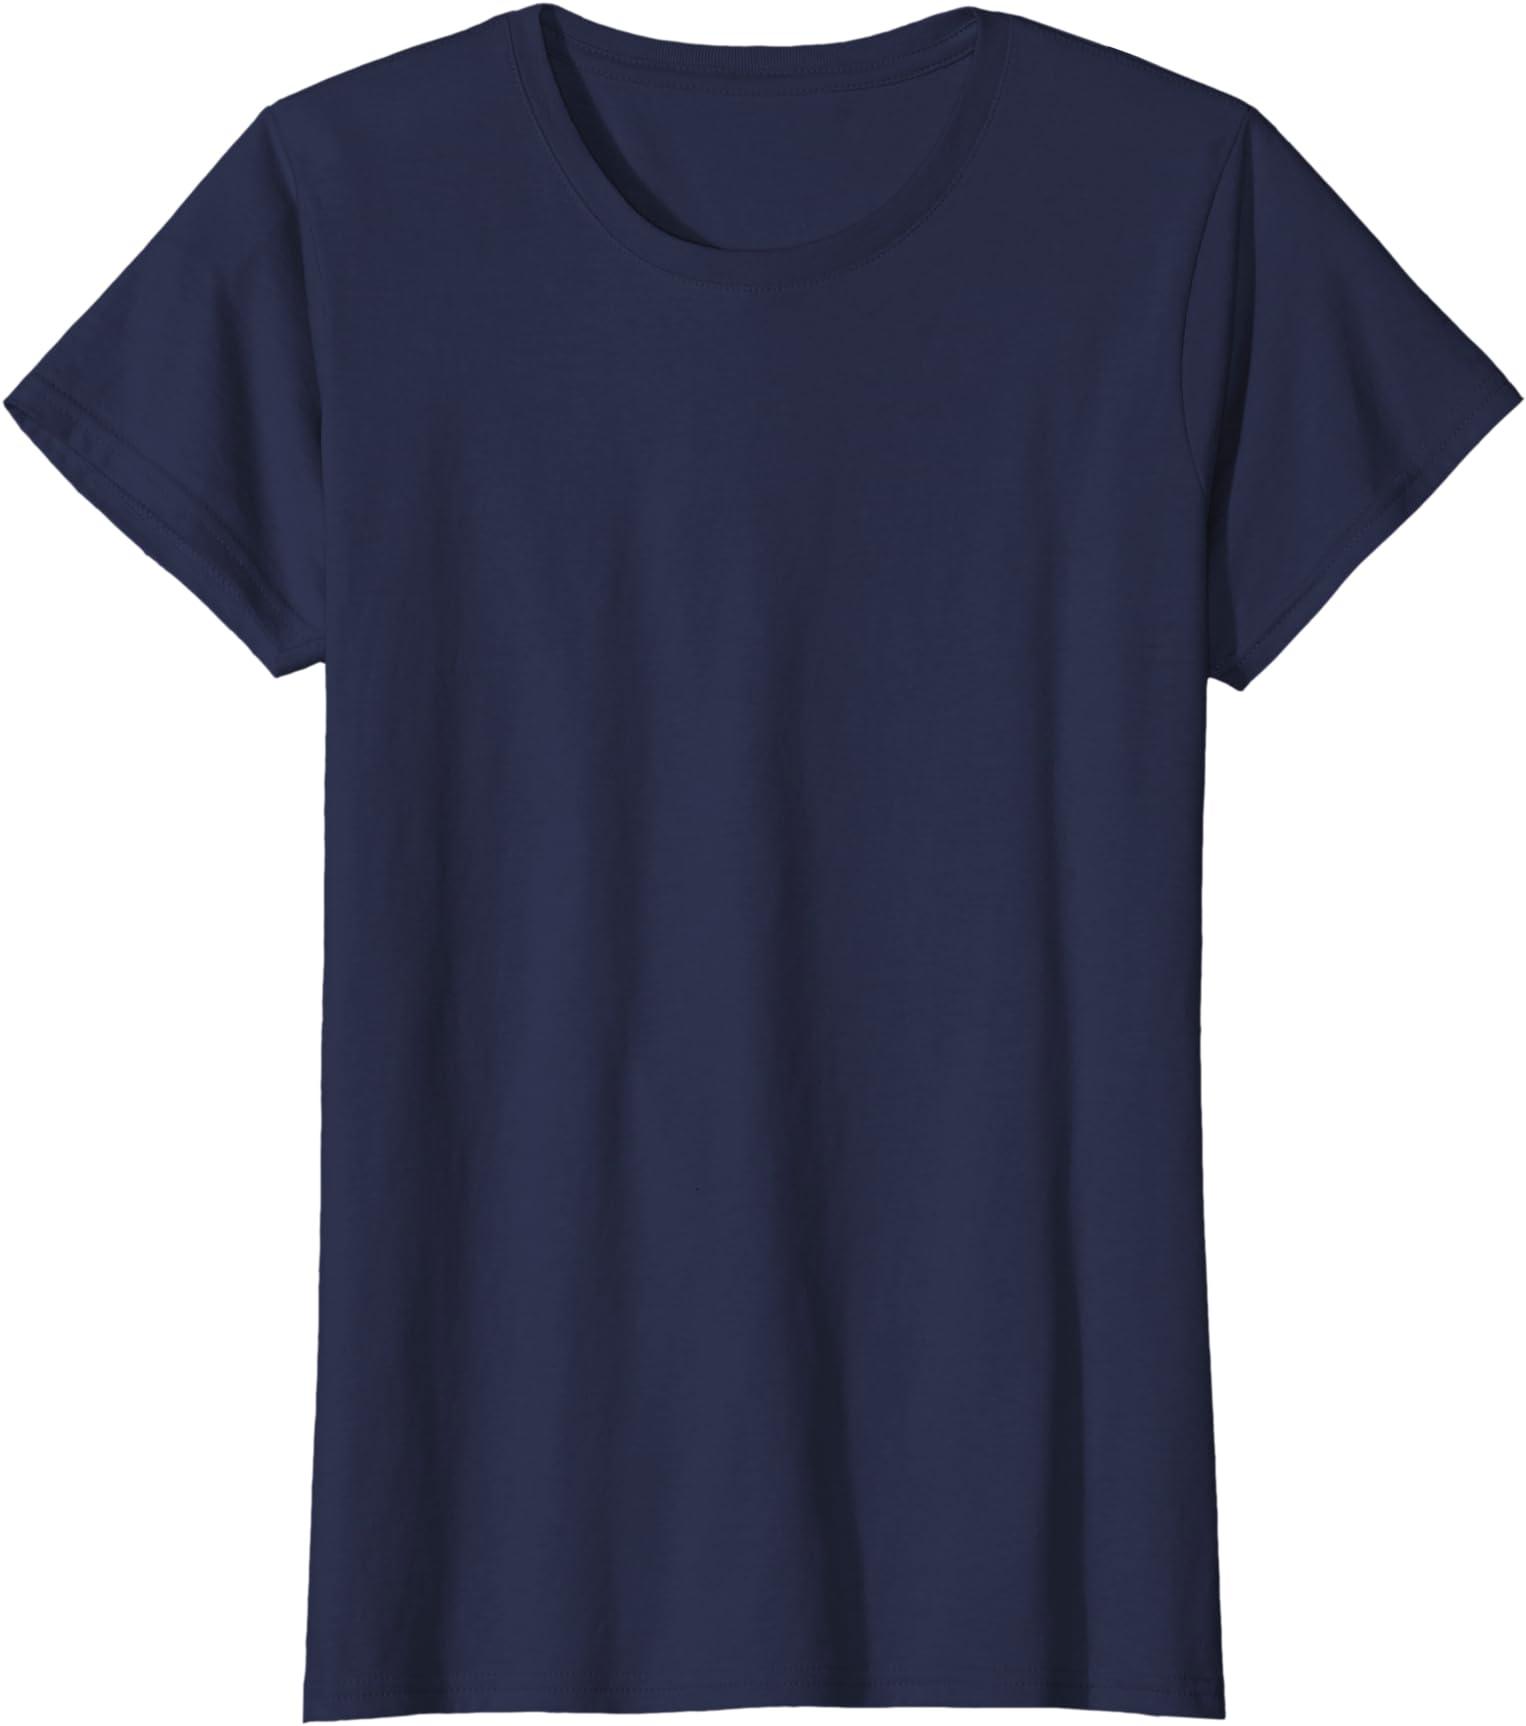 Greiff Corporate Wear Basic Damen Bluse Halbarm Regular Fit Schwarz Modell 6516